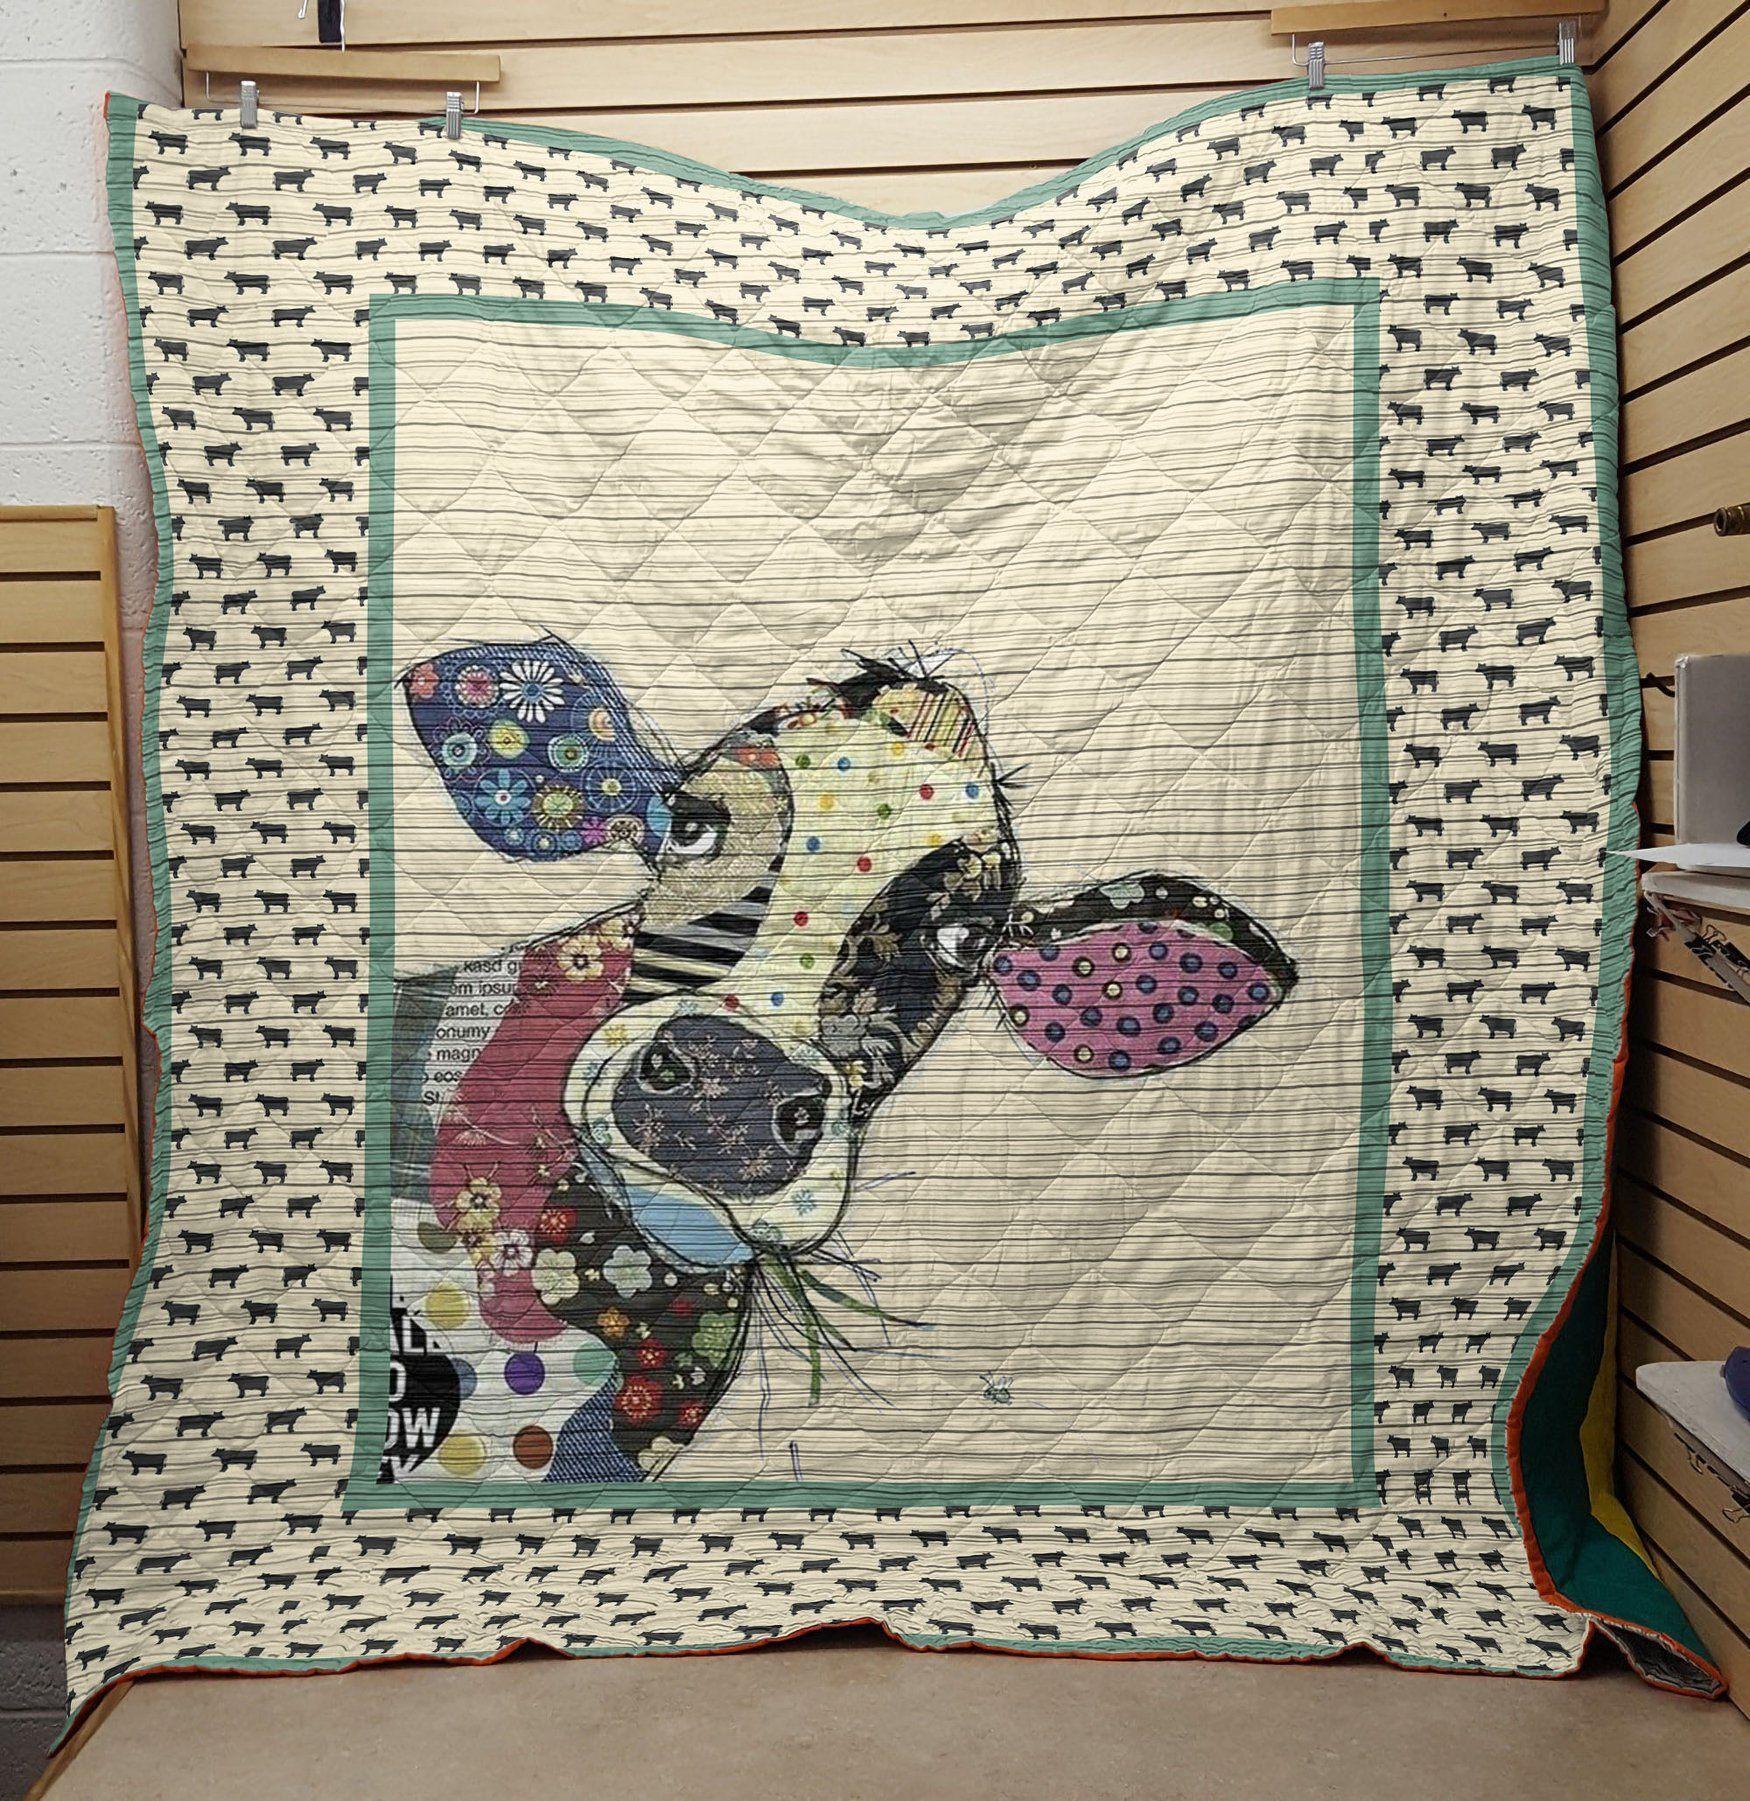 Cow fabric blanket - maria